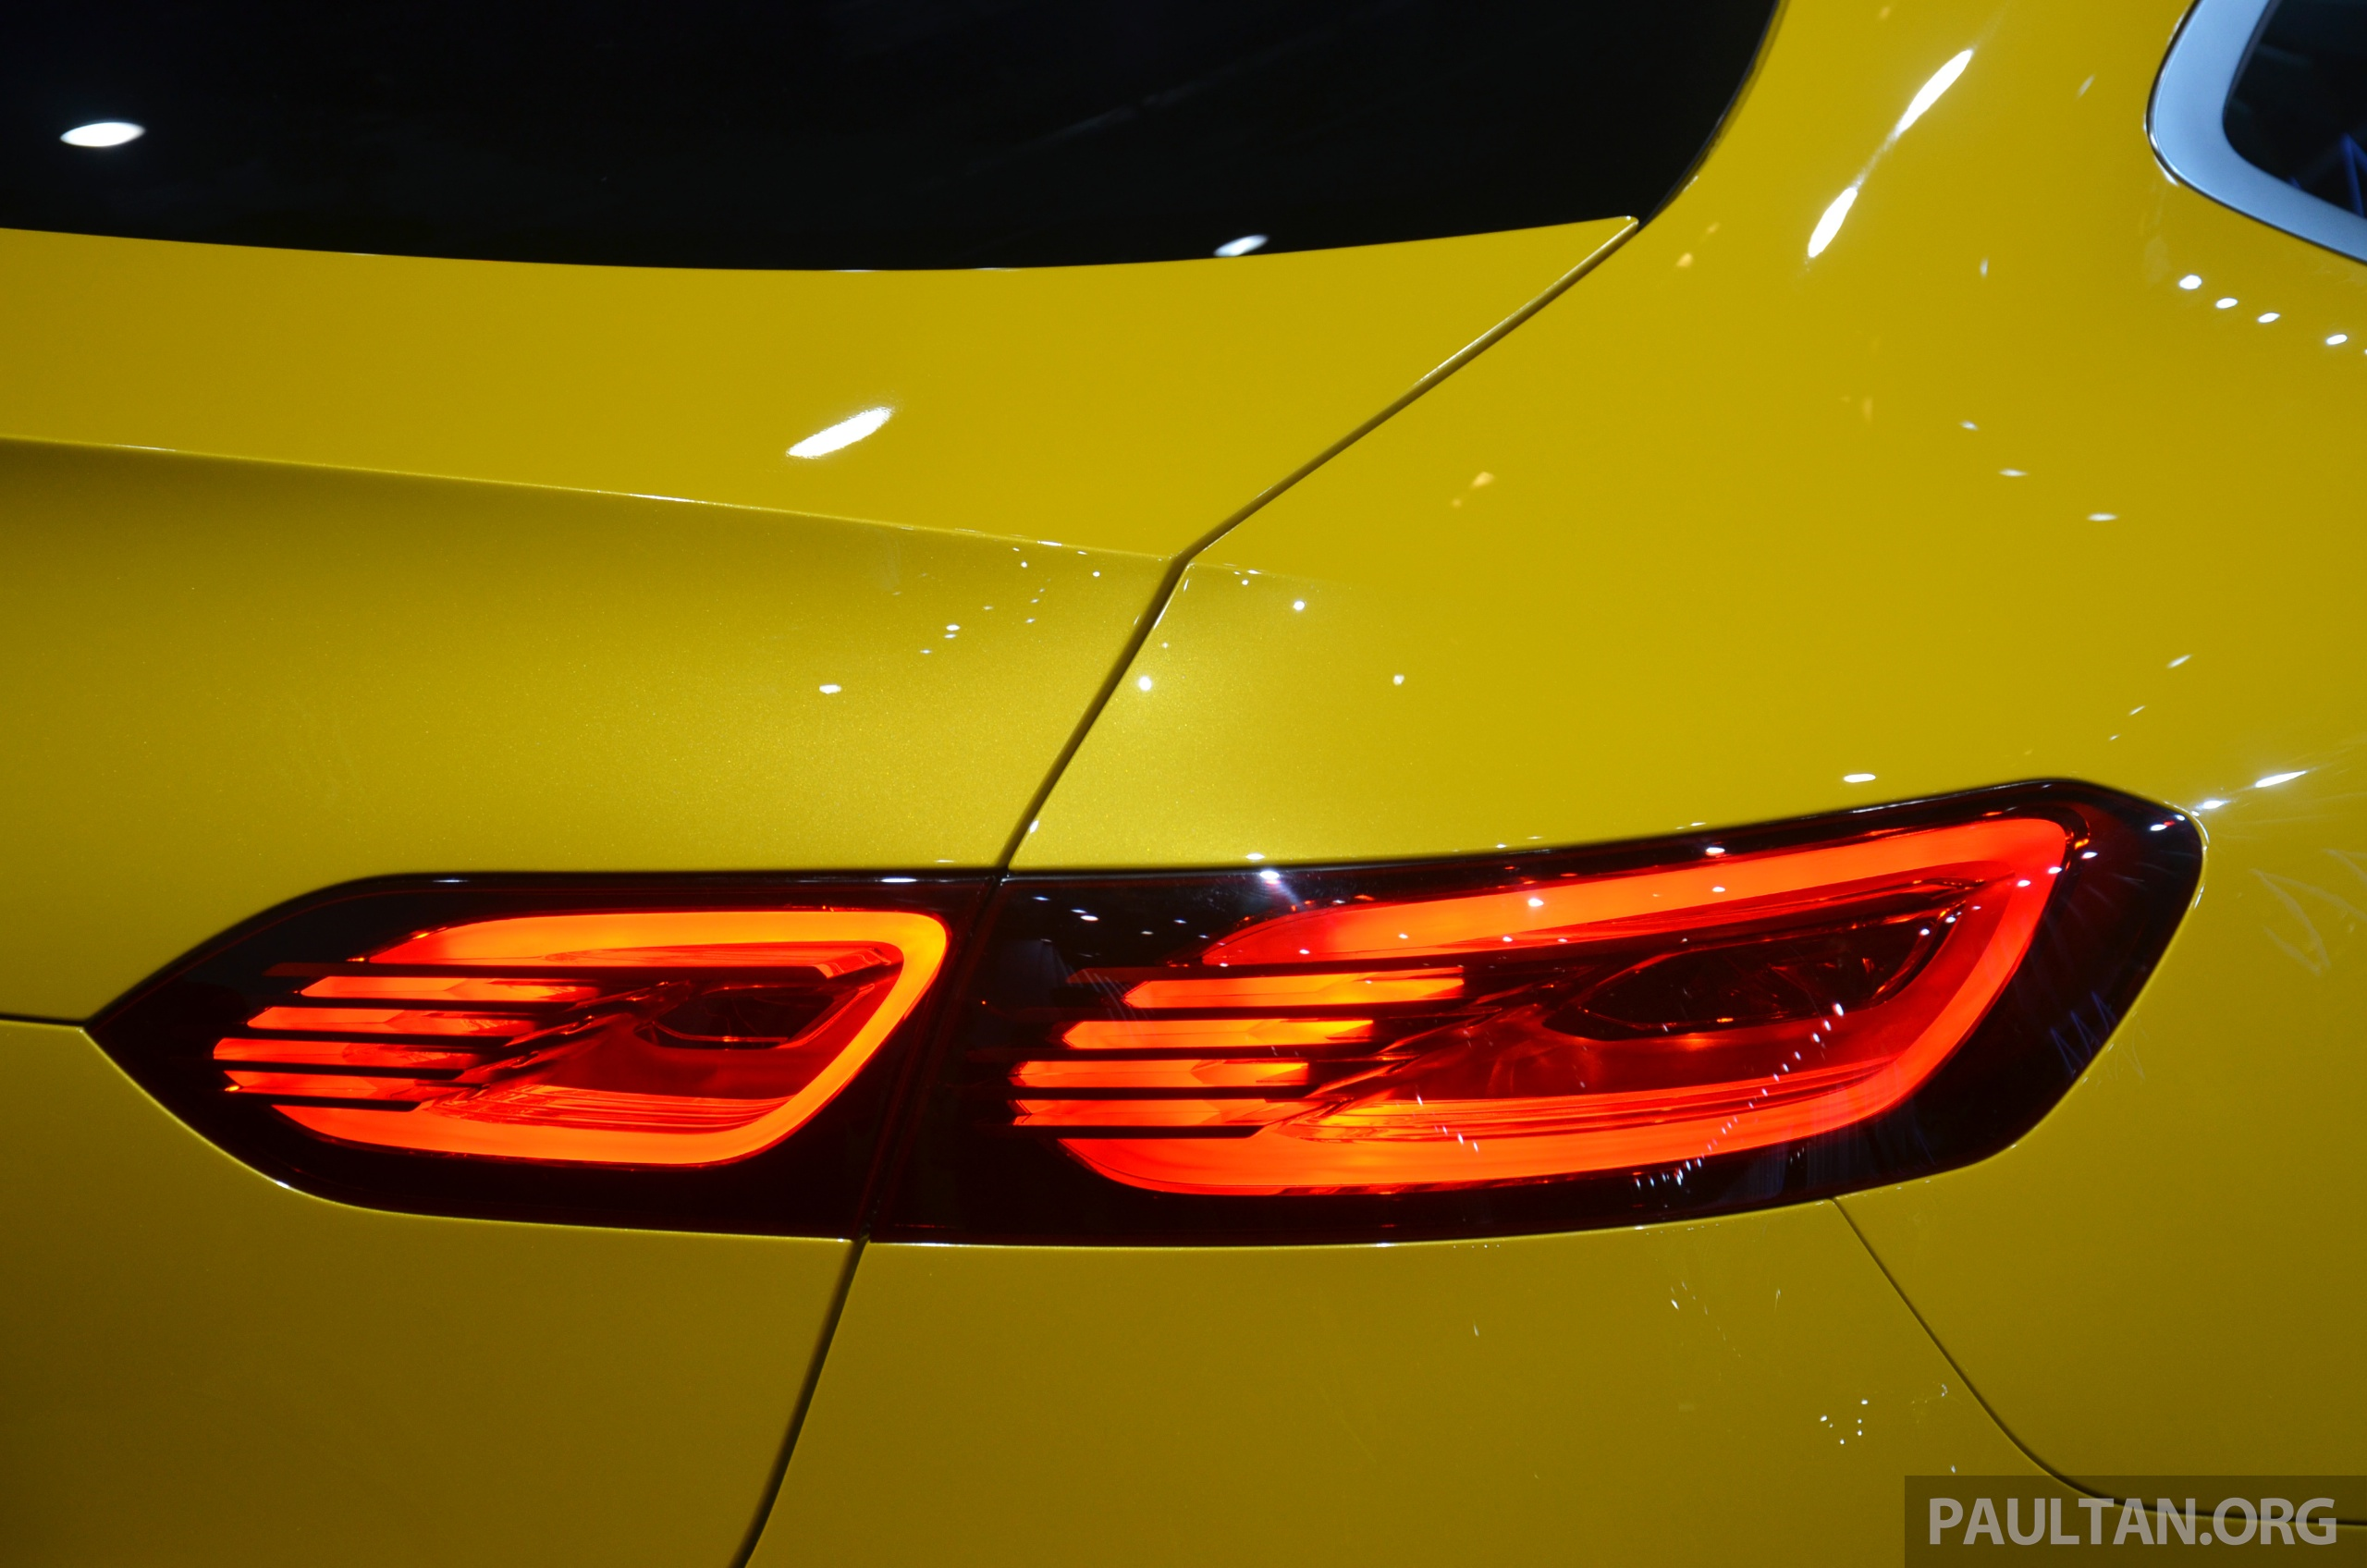 https://s2.paultan.org/image/2015/04/mercedes-benz-glc-coupe-concept-shanghai-1216.jpg